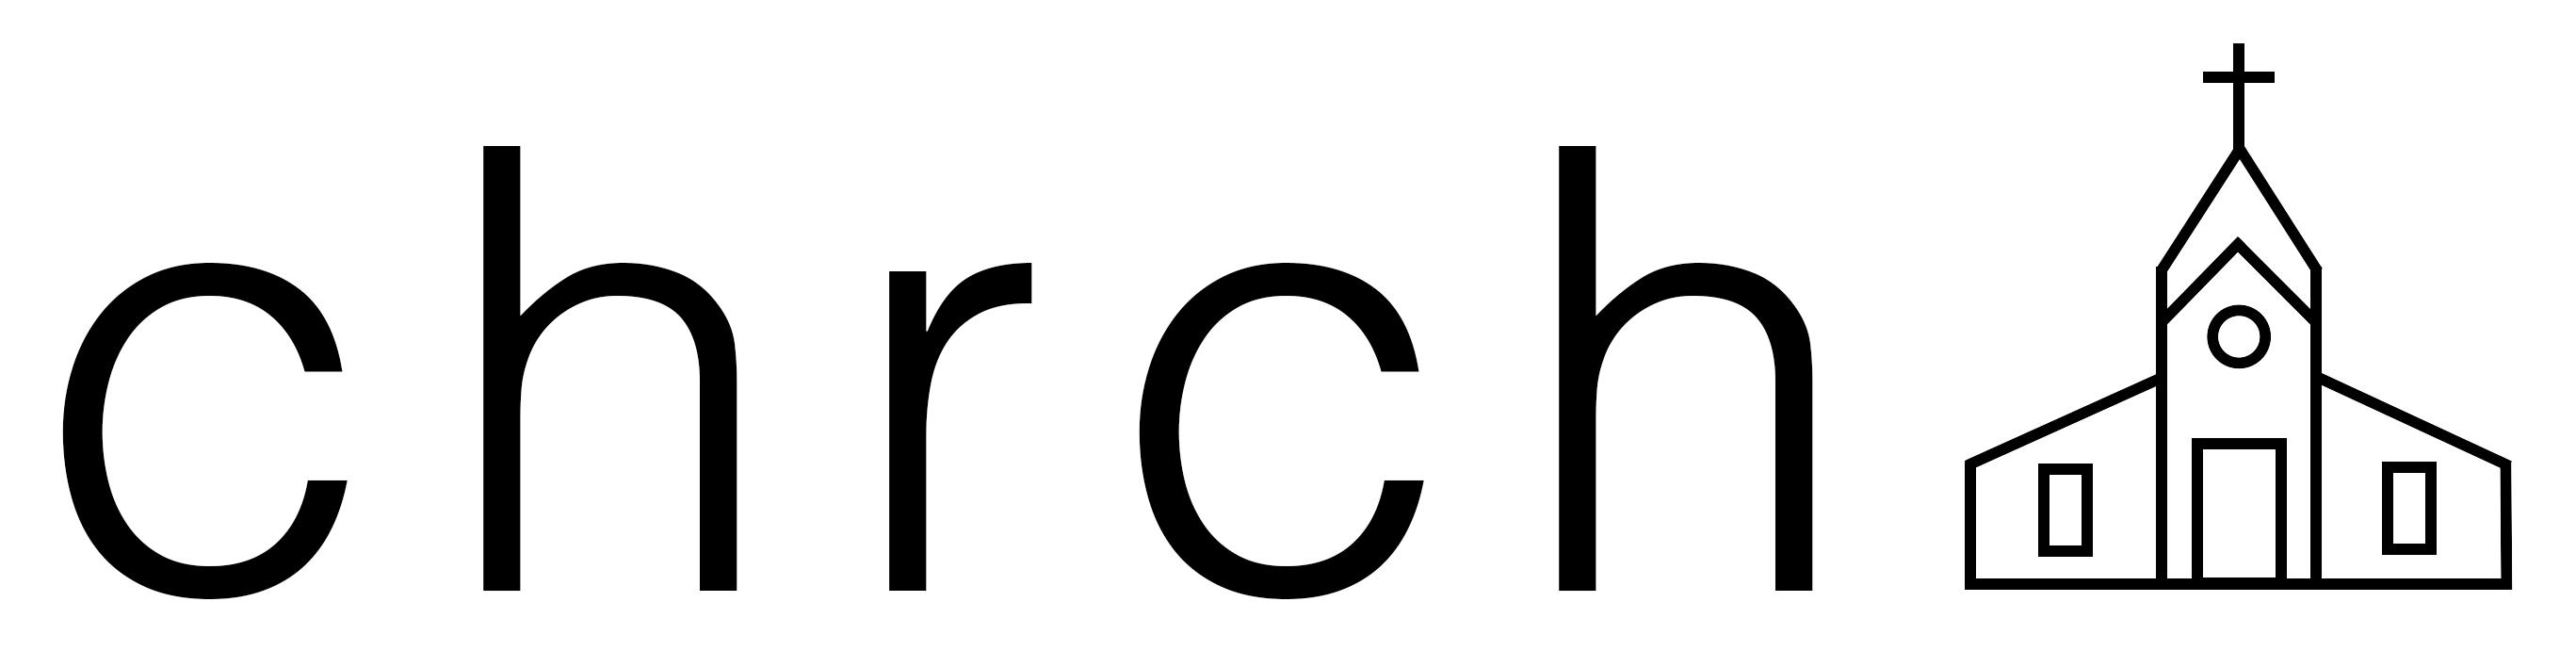 chrch community